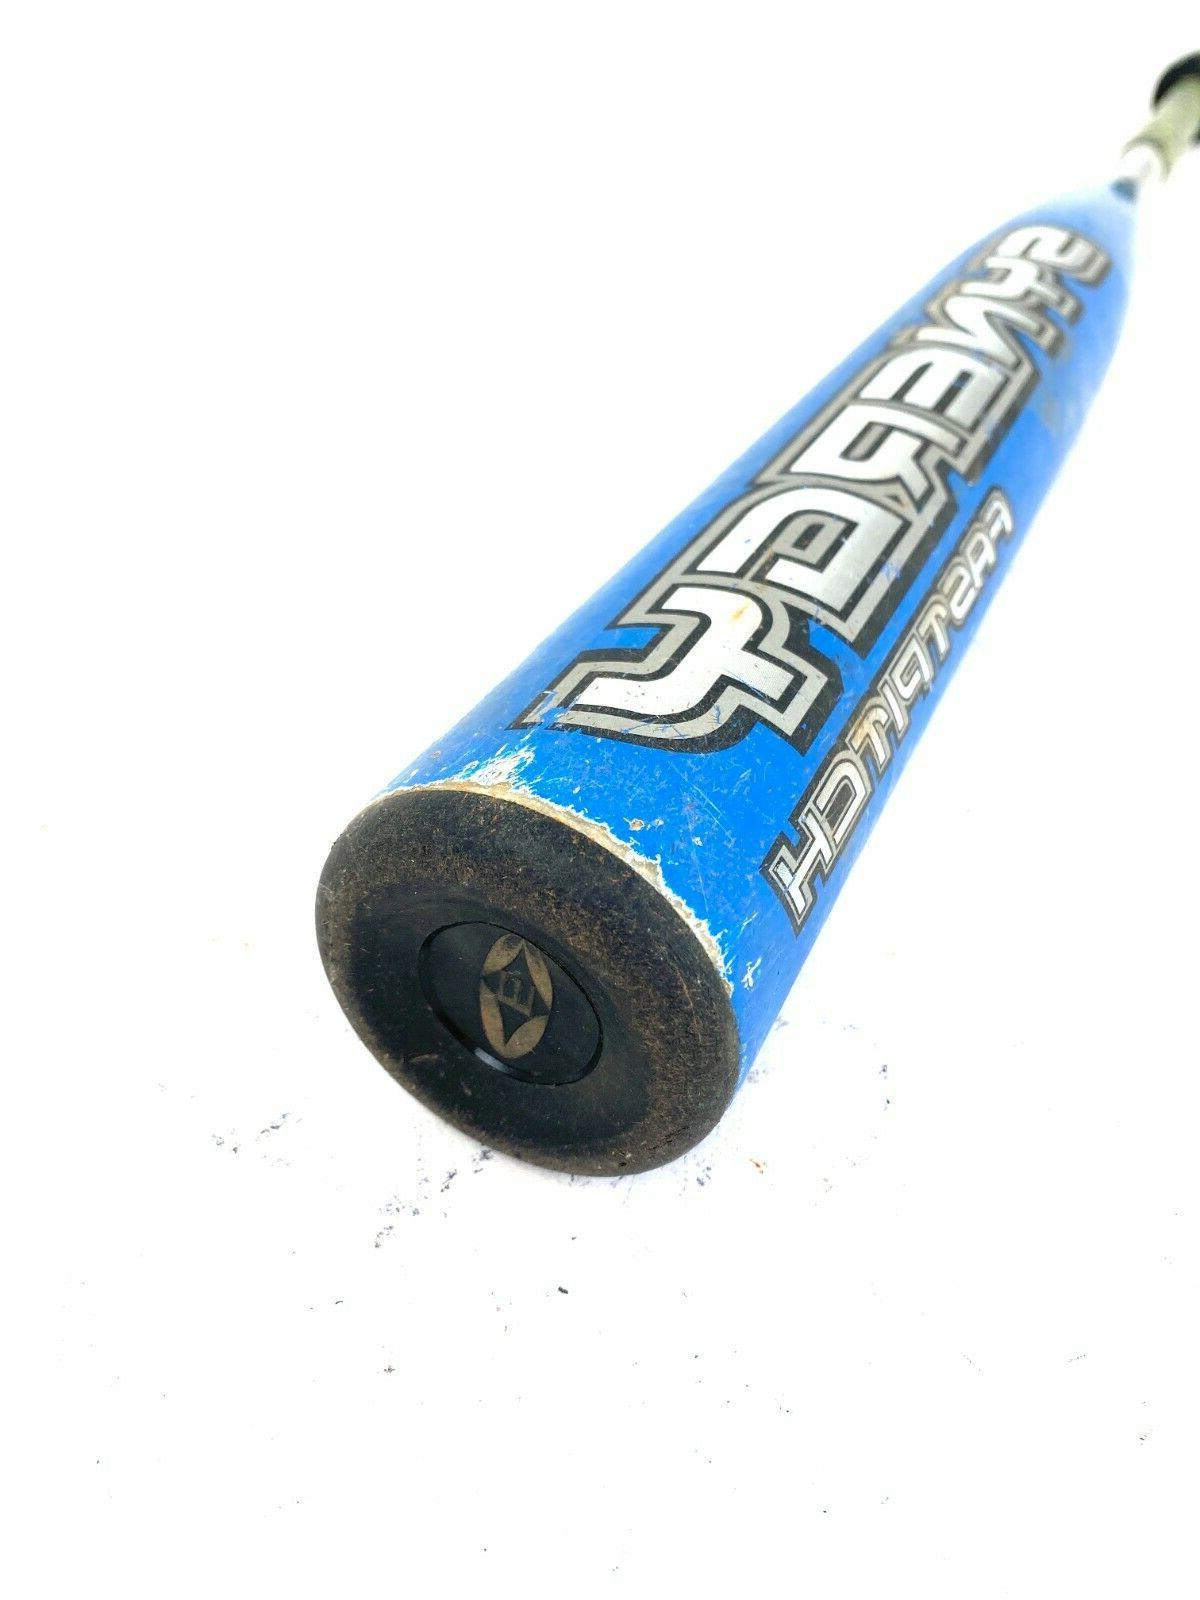 Easton Fast-pitch Bat Synergy 31/21 -10